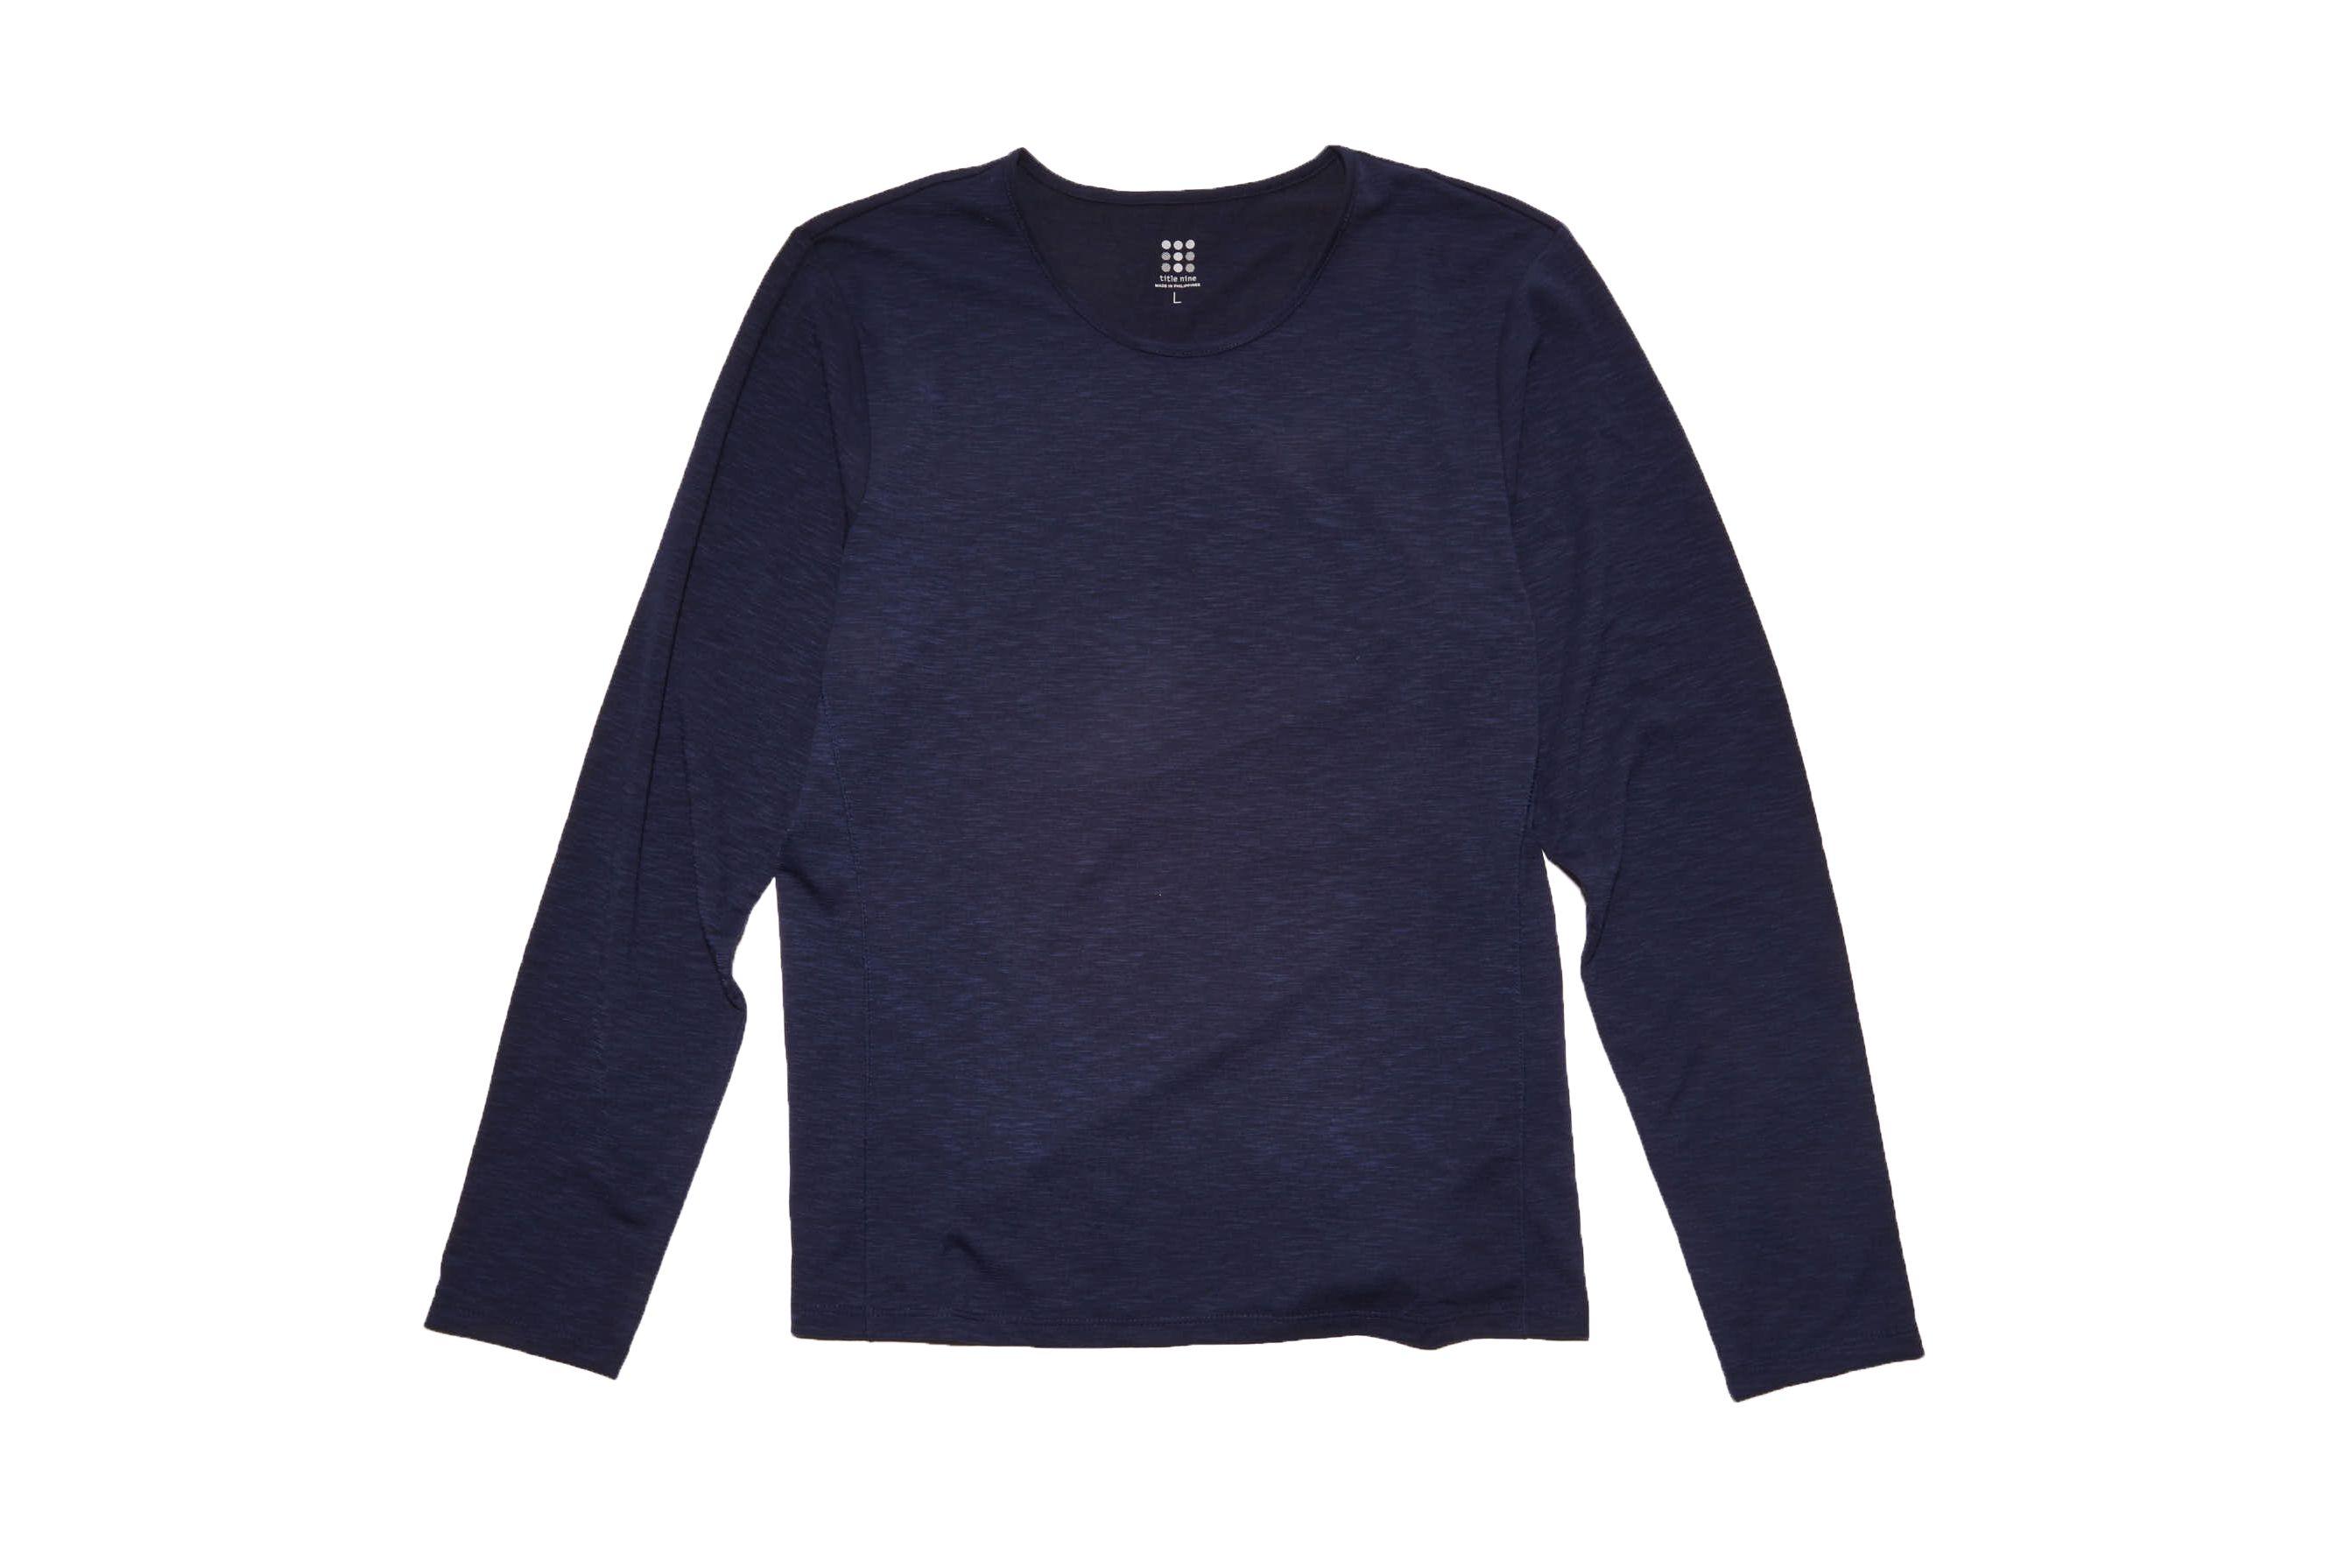 NEW Mens T Shirt Medium Wicking Athletic Silky Top Black Gray Workout Run Gym